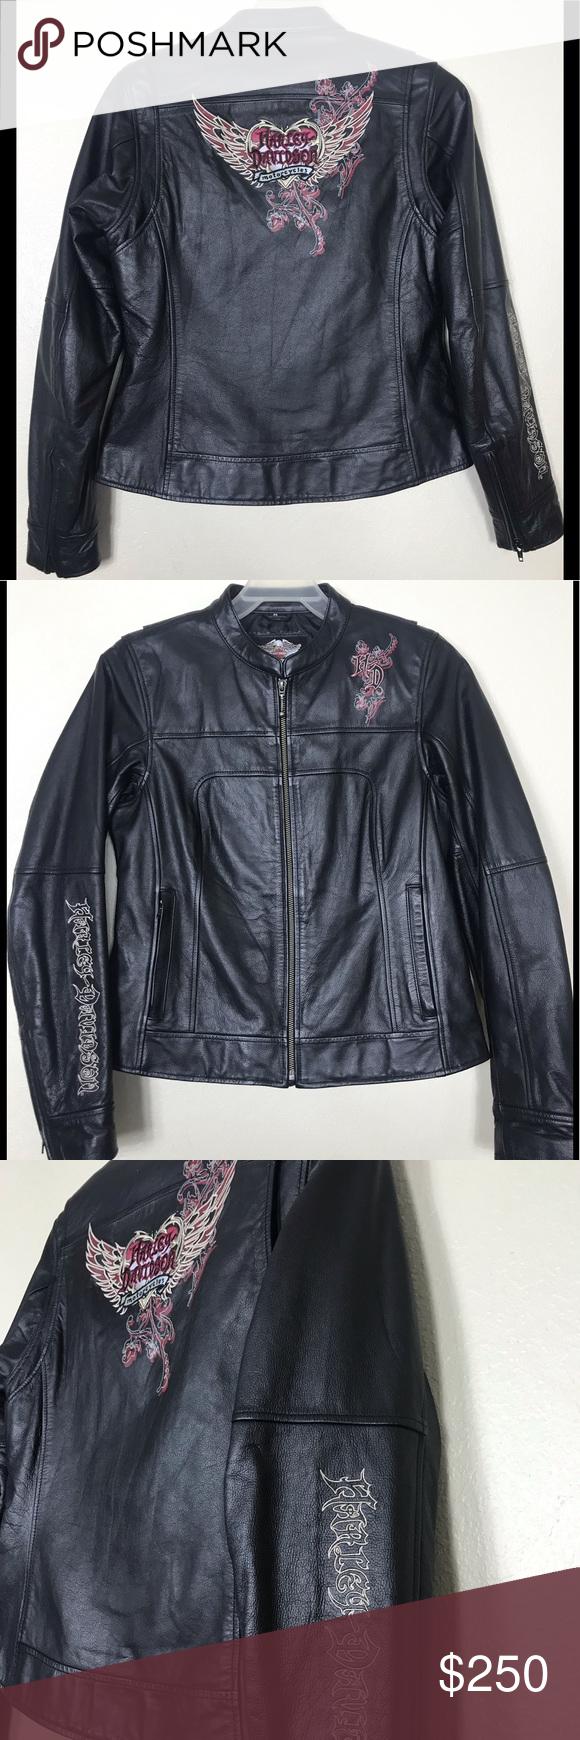 Harley Davidson Spontaneity Leather Jacket Sz M Clothes Design Burgundy Jacket Outfit Leather Jacket [ 1740 x 580 Pixel ]